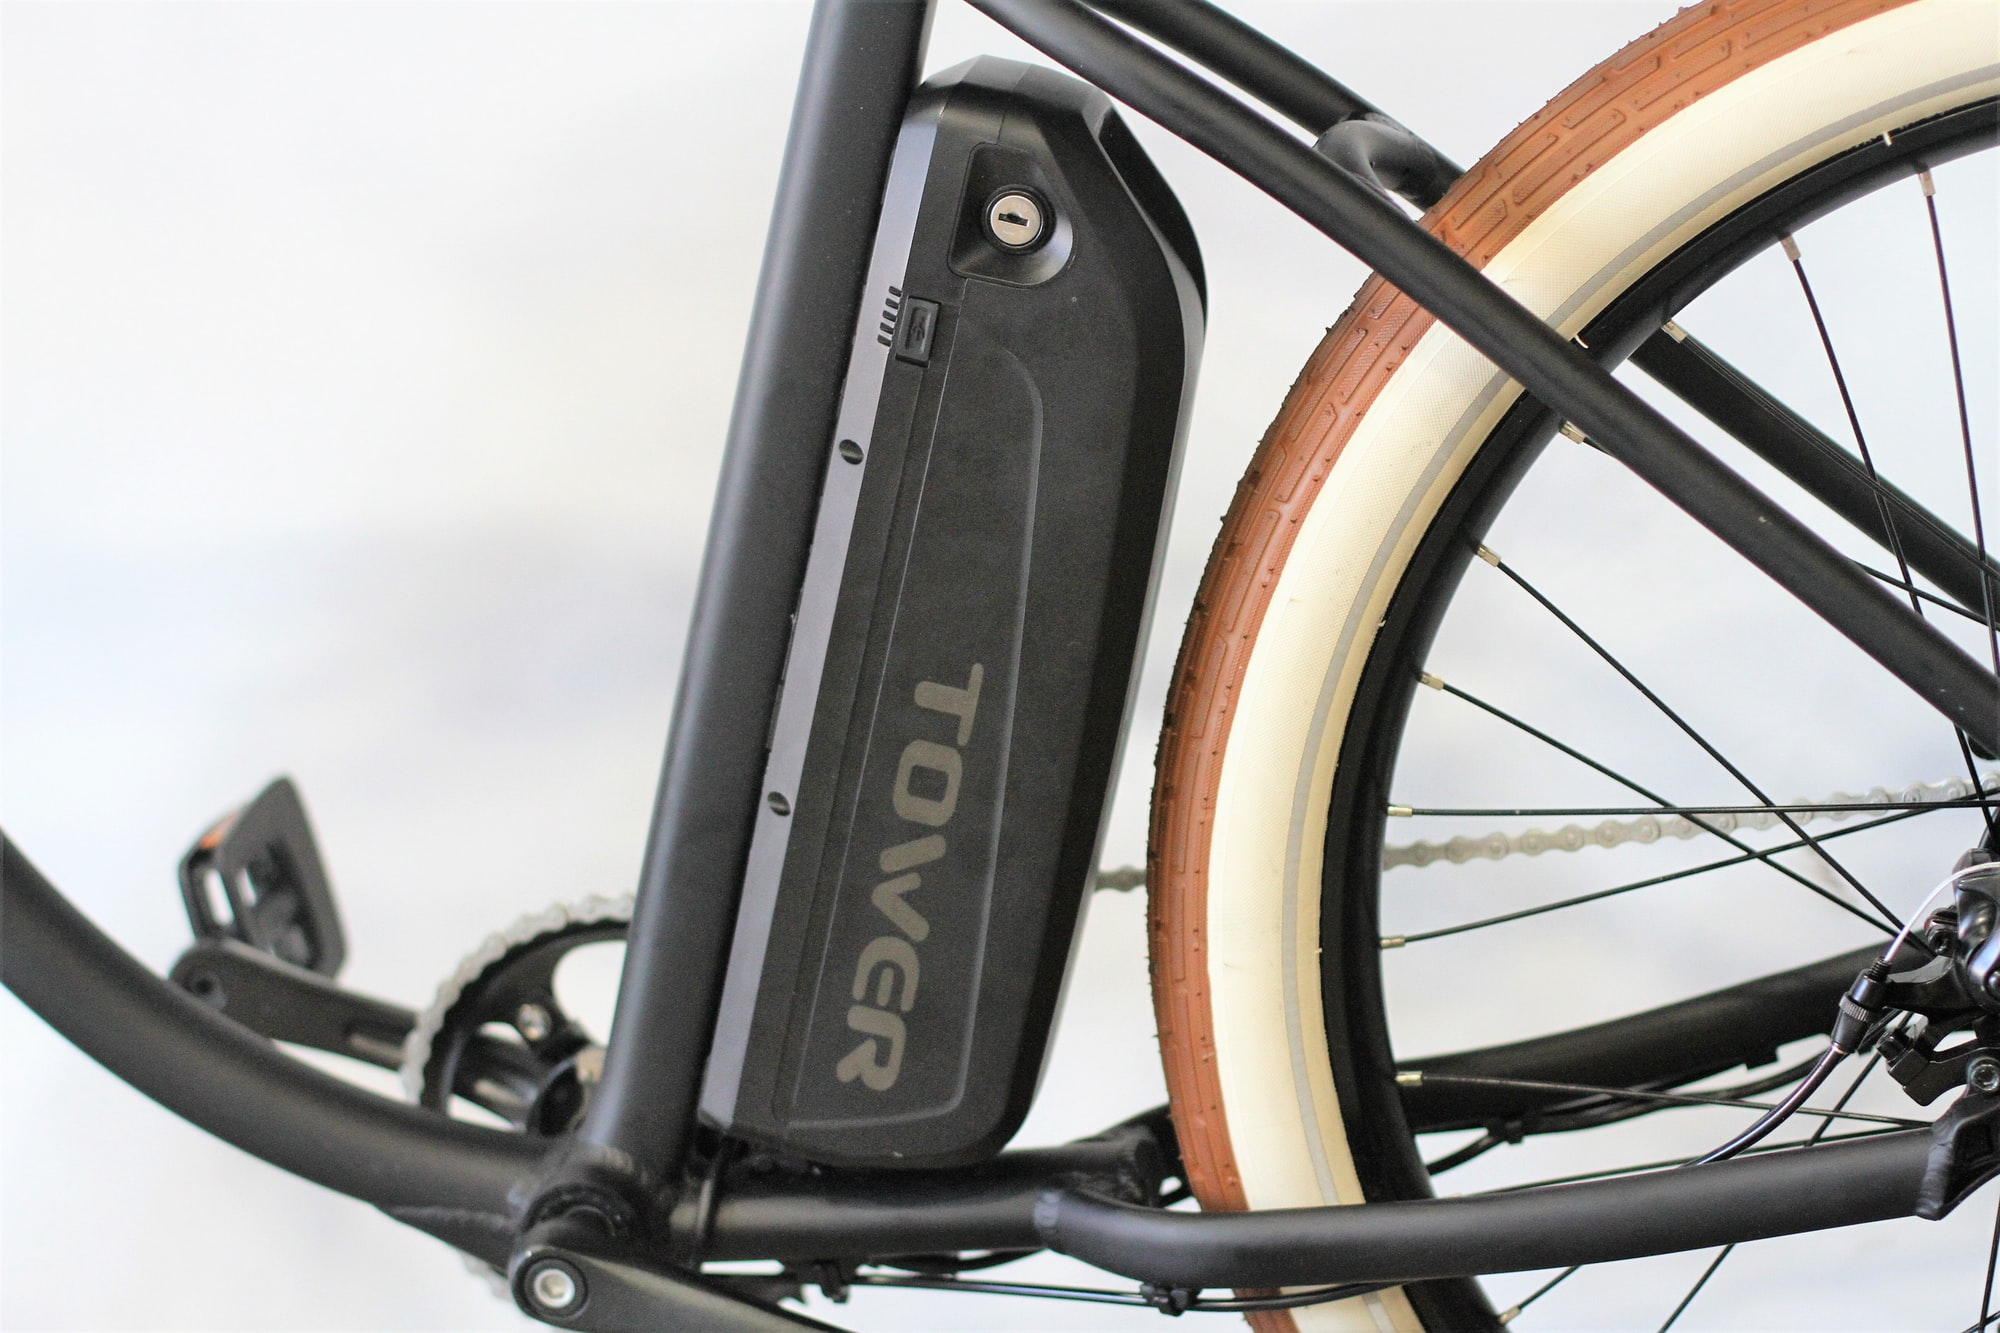 E-bike motors | How do they work?